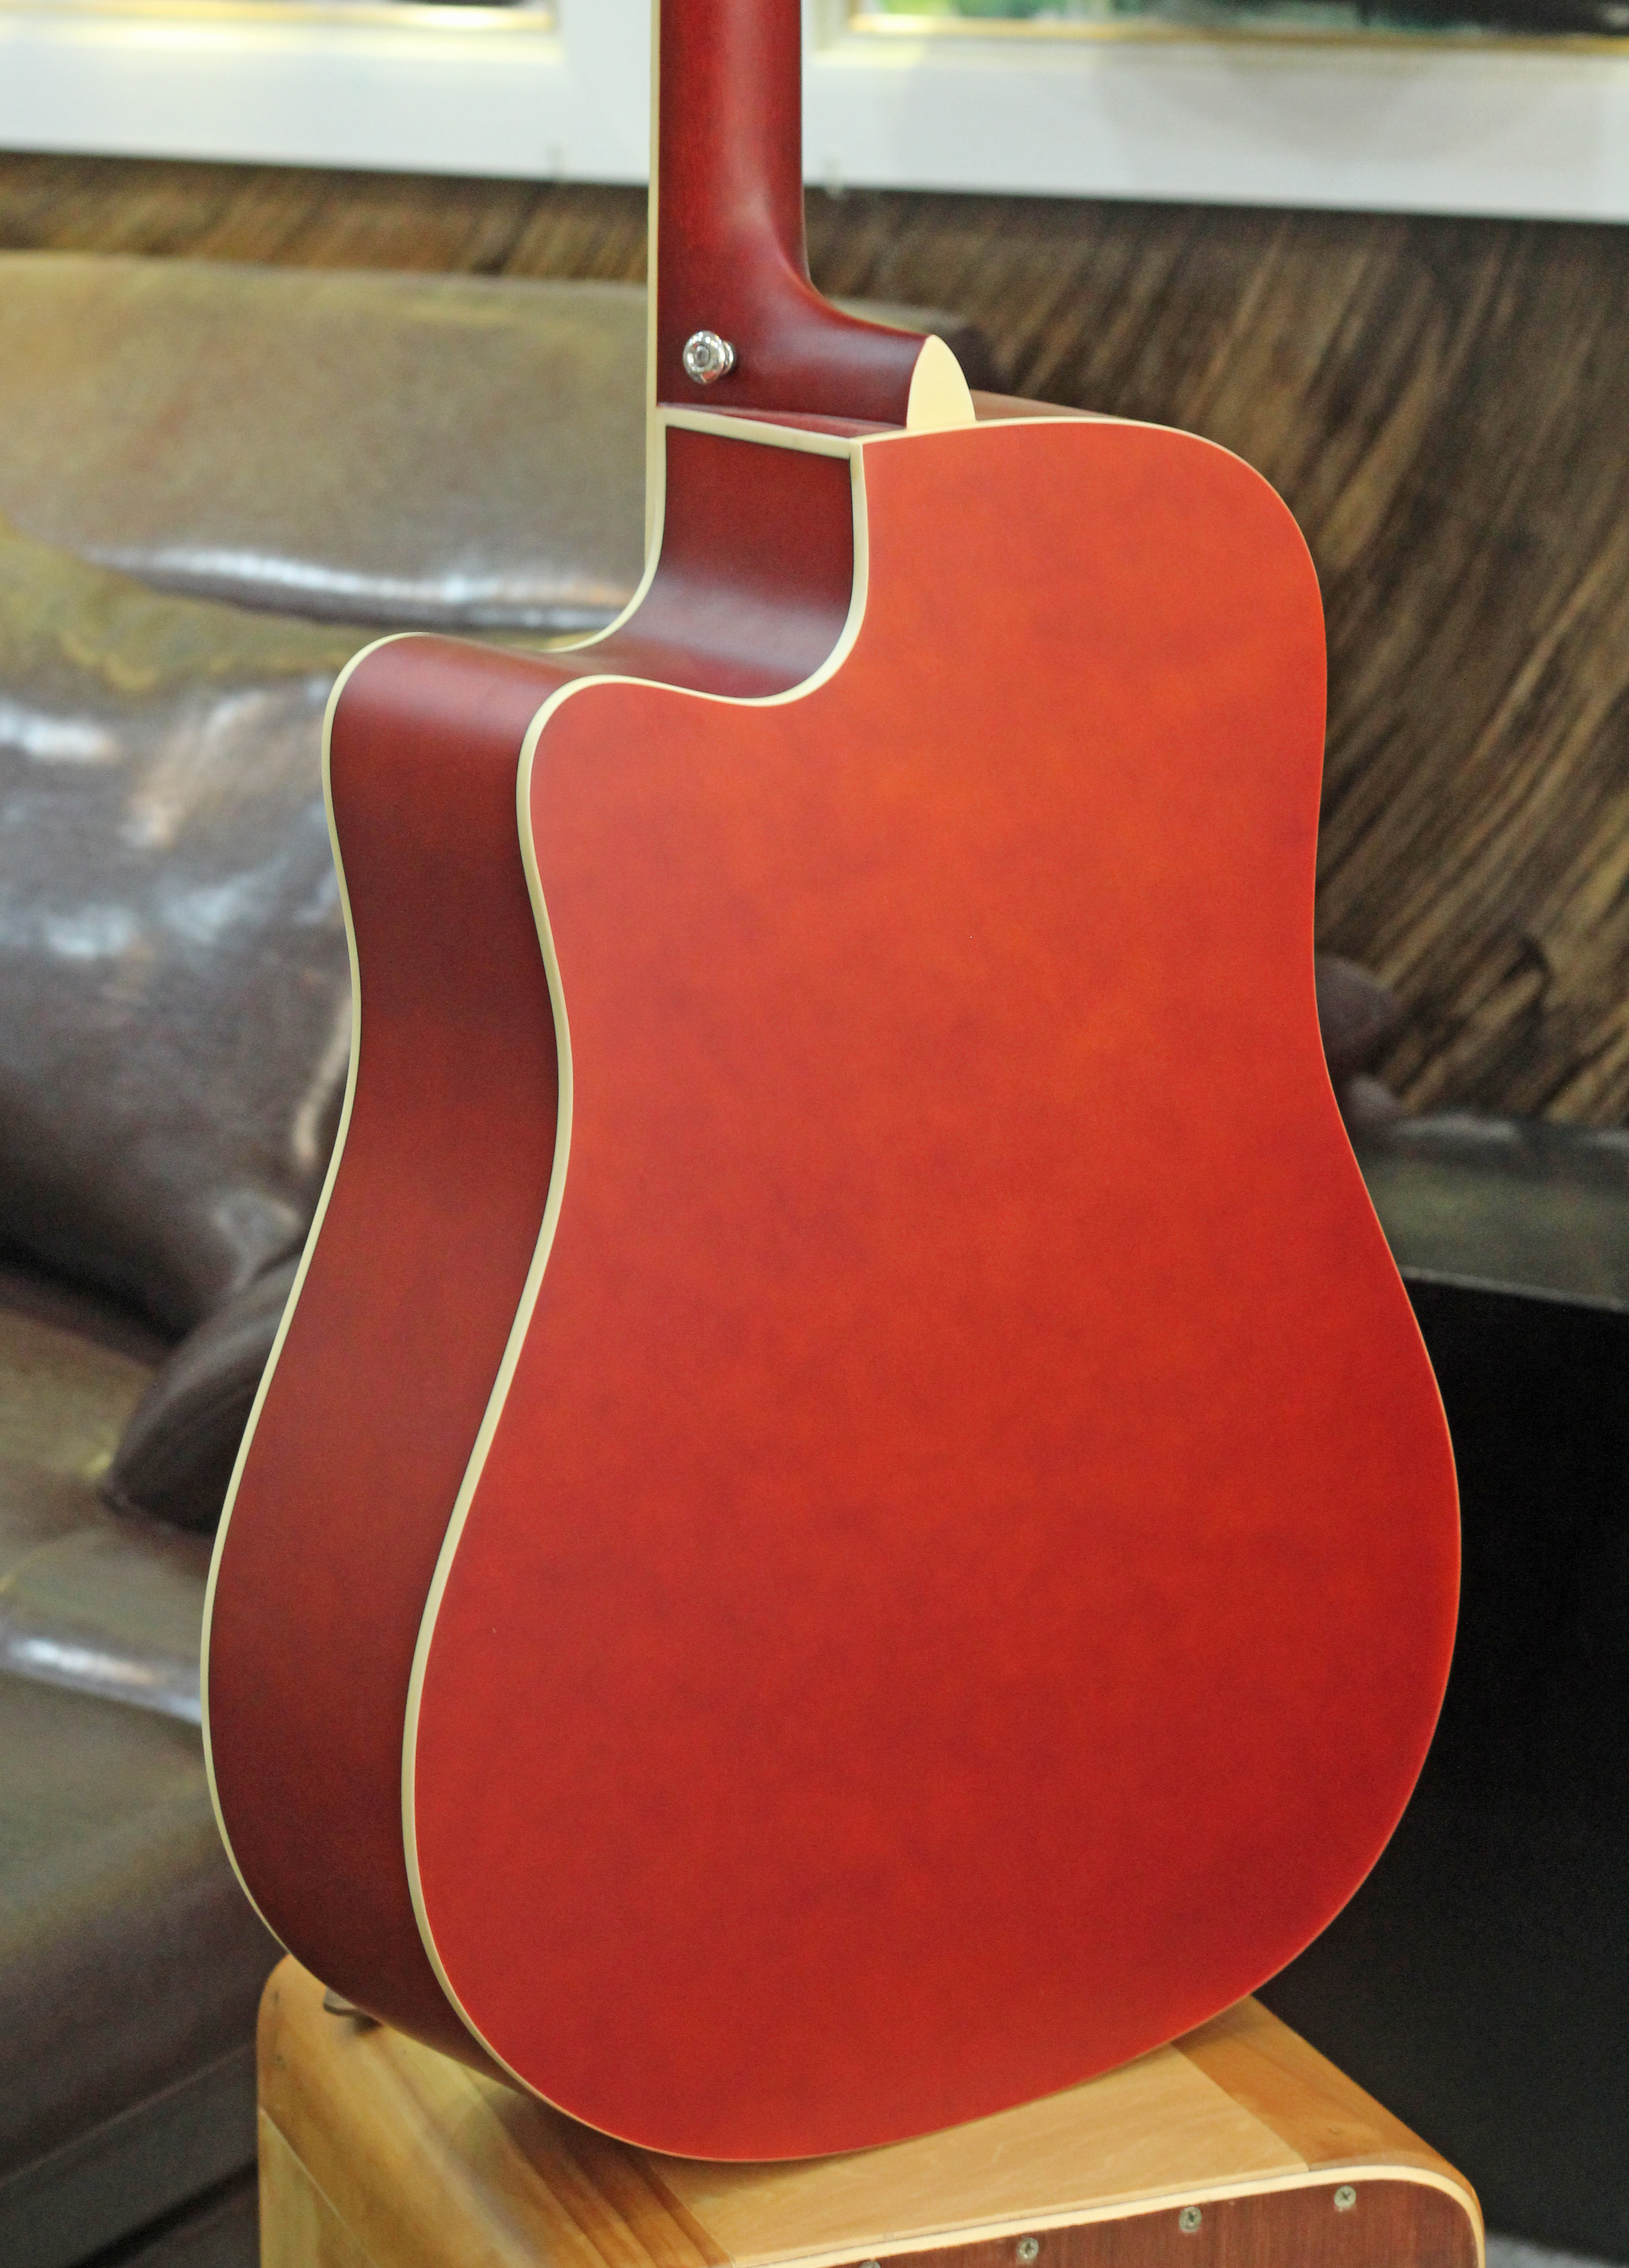 Đàn Guitar Acoustic Rosen Sunburst G11 (Gỗ Thịt- Solid top )